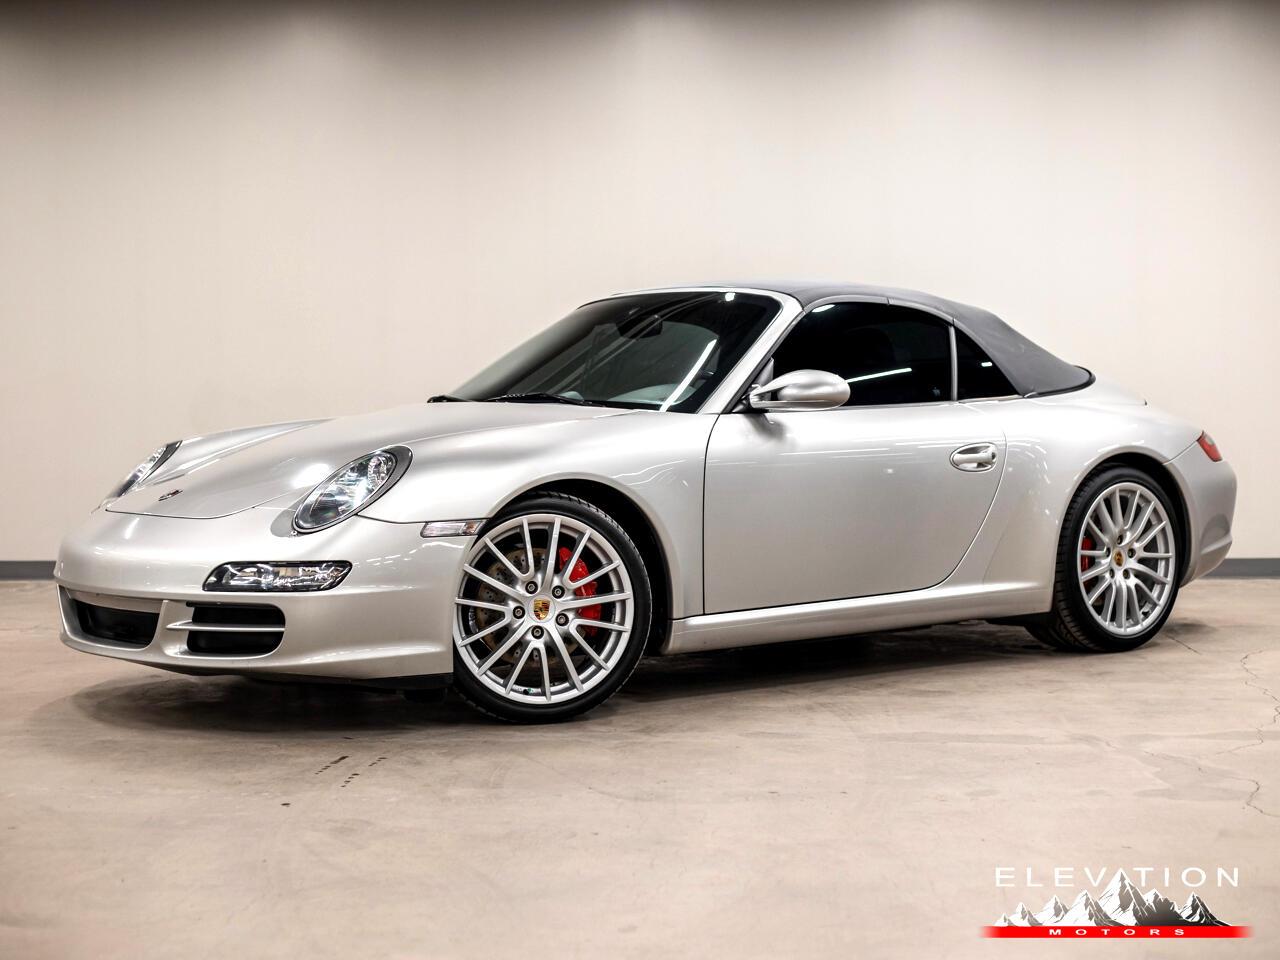 Porsche 911 Carrera S Cabriolet 2006